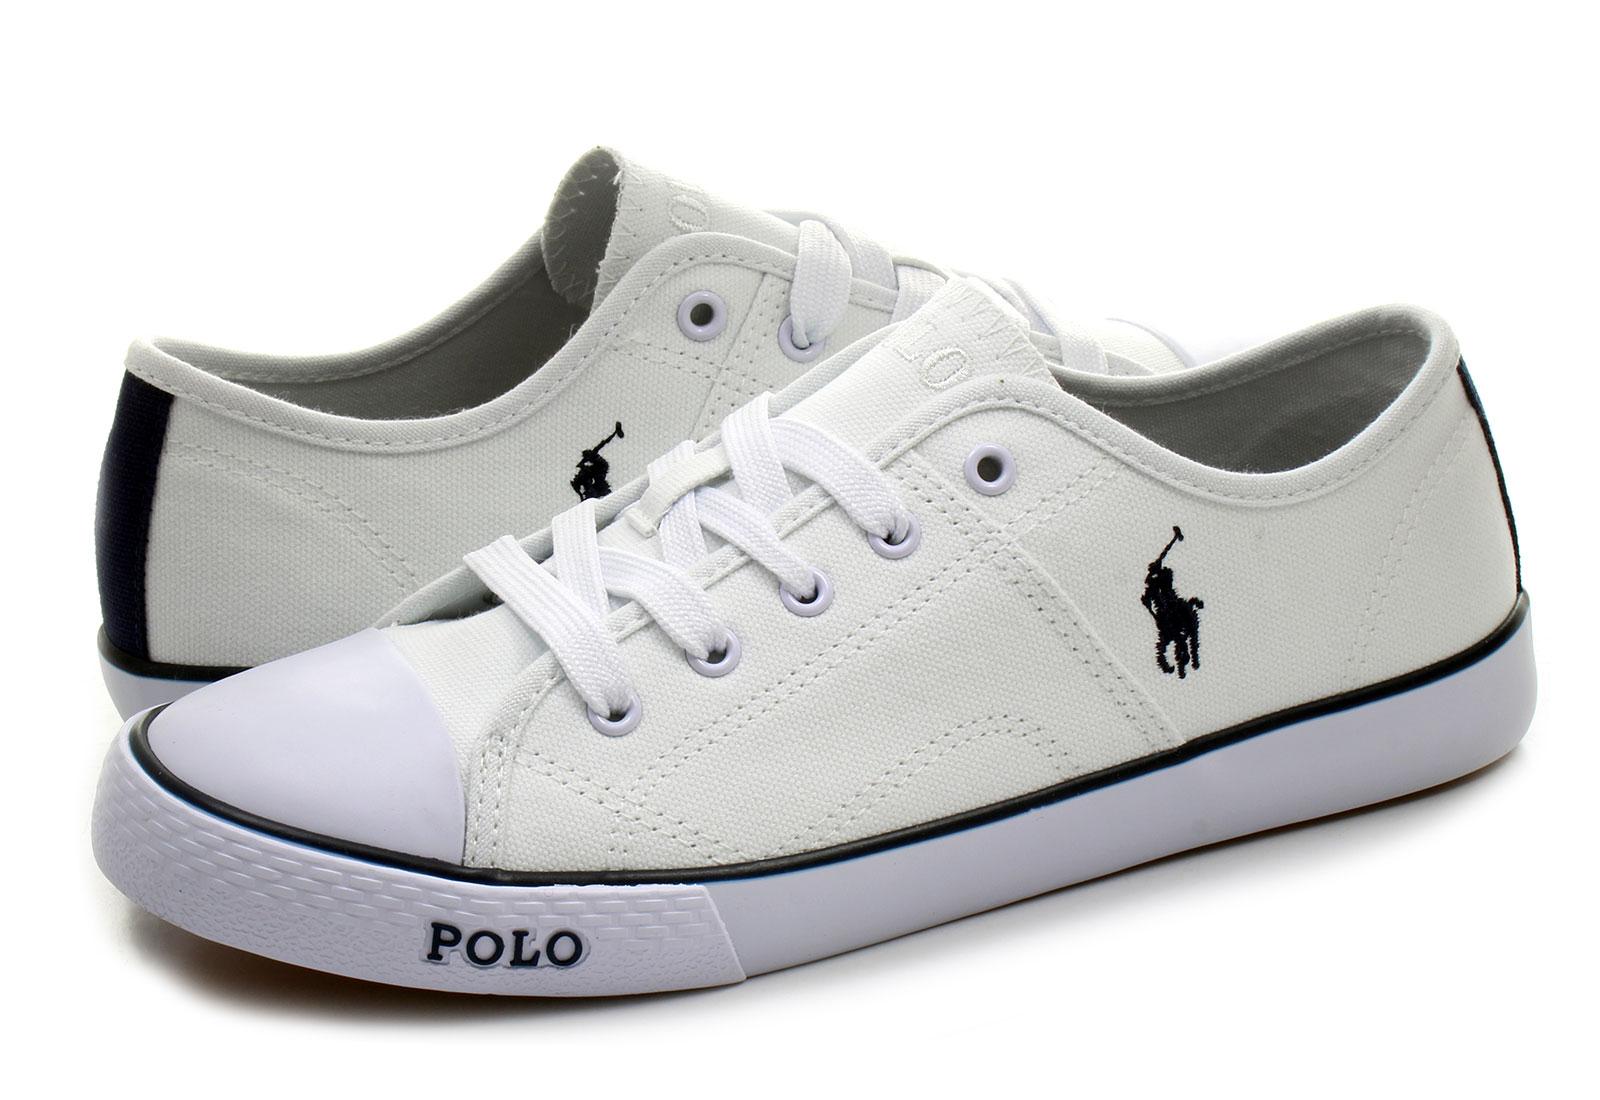 Polo Ralph Lauren Cipő - Daymond - 992922-j-wht - Office Shoes ... e423e5f33b